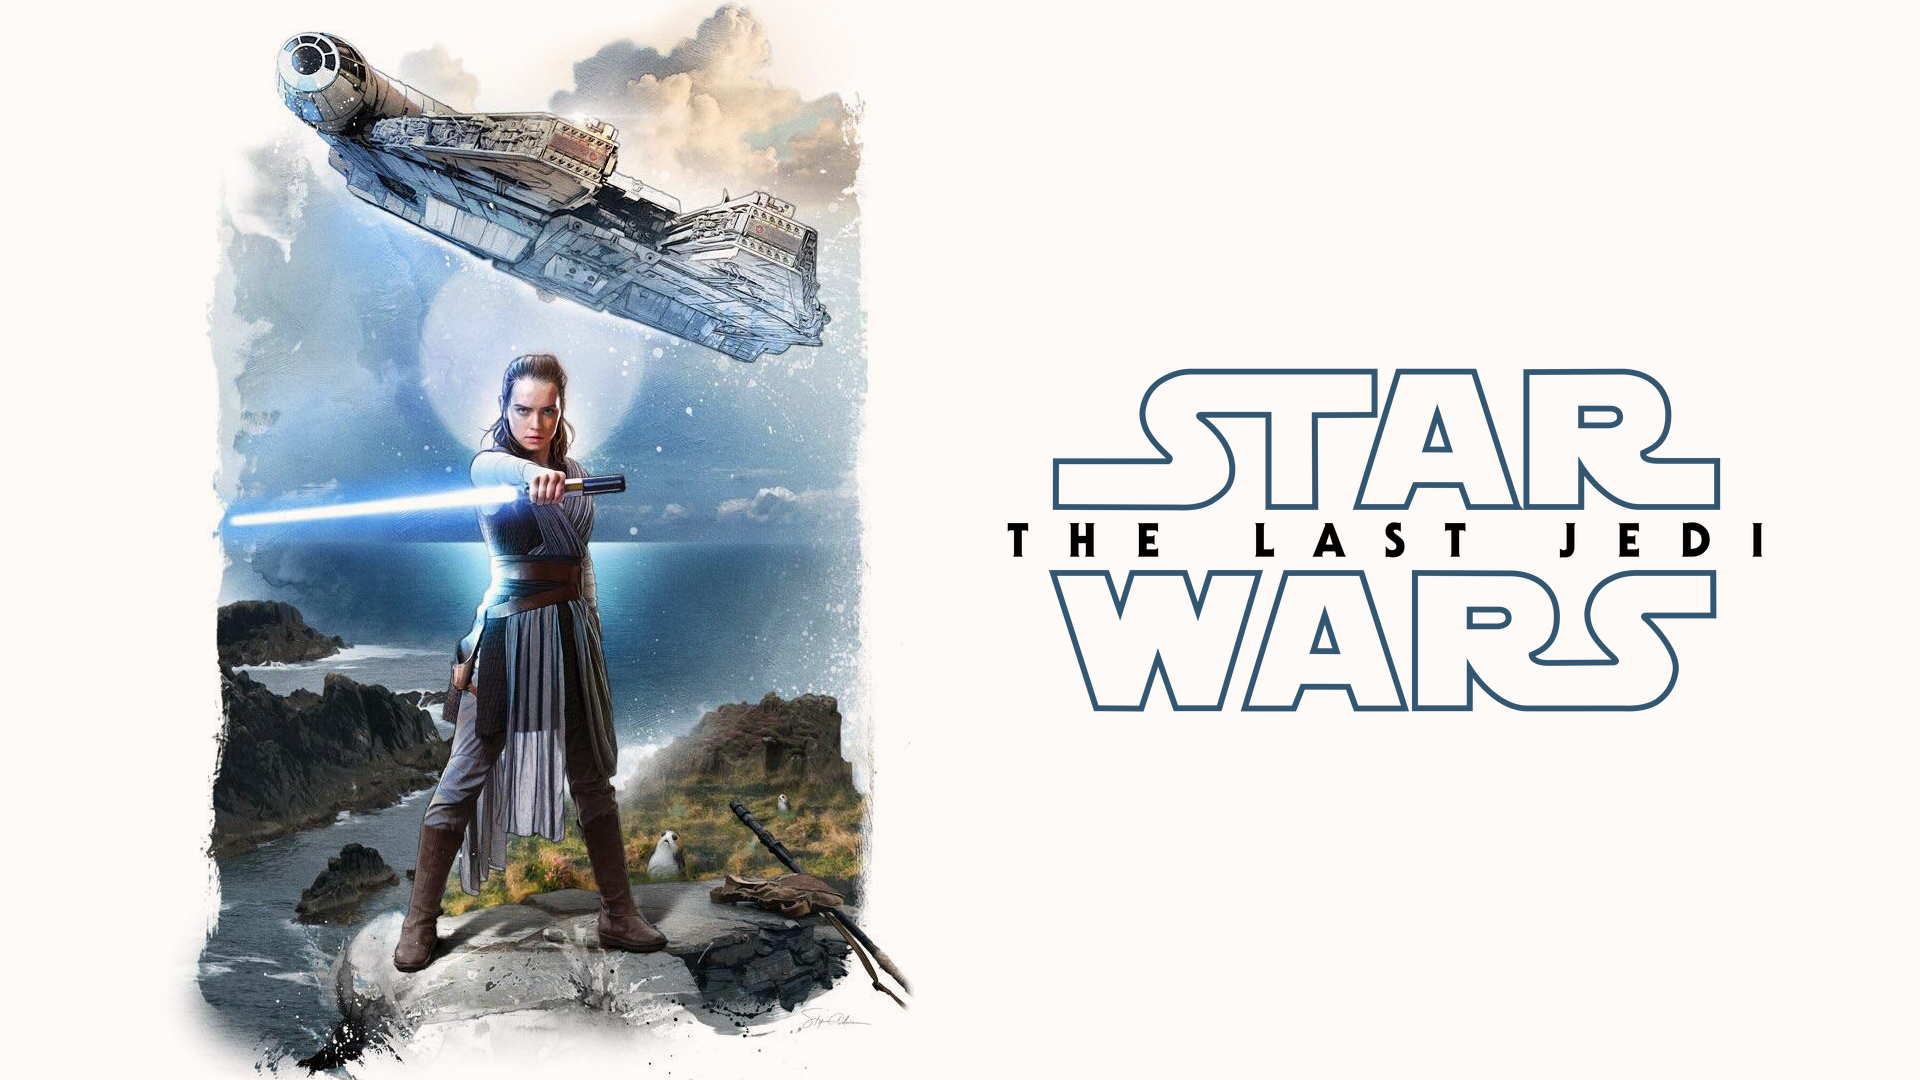 Star Wars The Last Jedi Wallpaper Rey Ahch To By Spirit Of Adventure On Deviantart